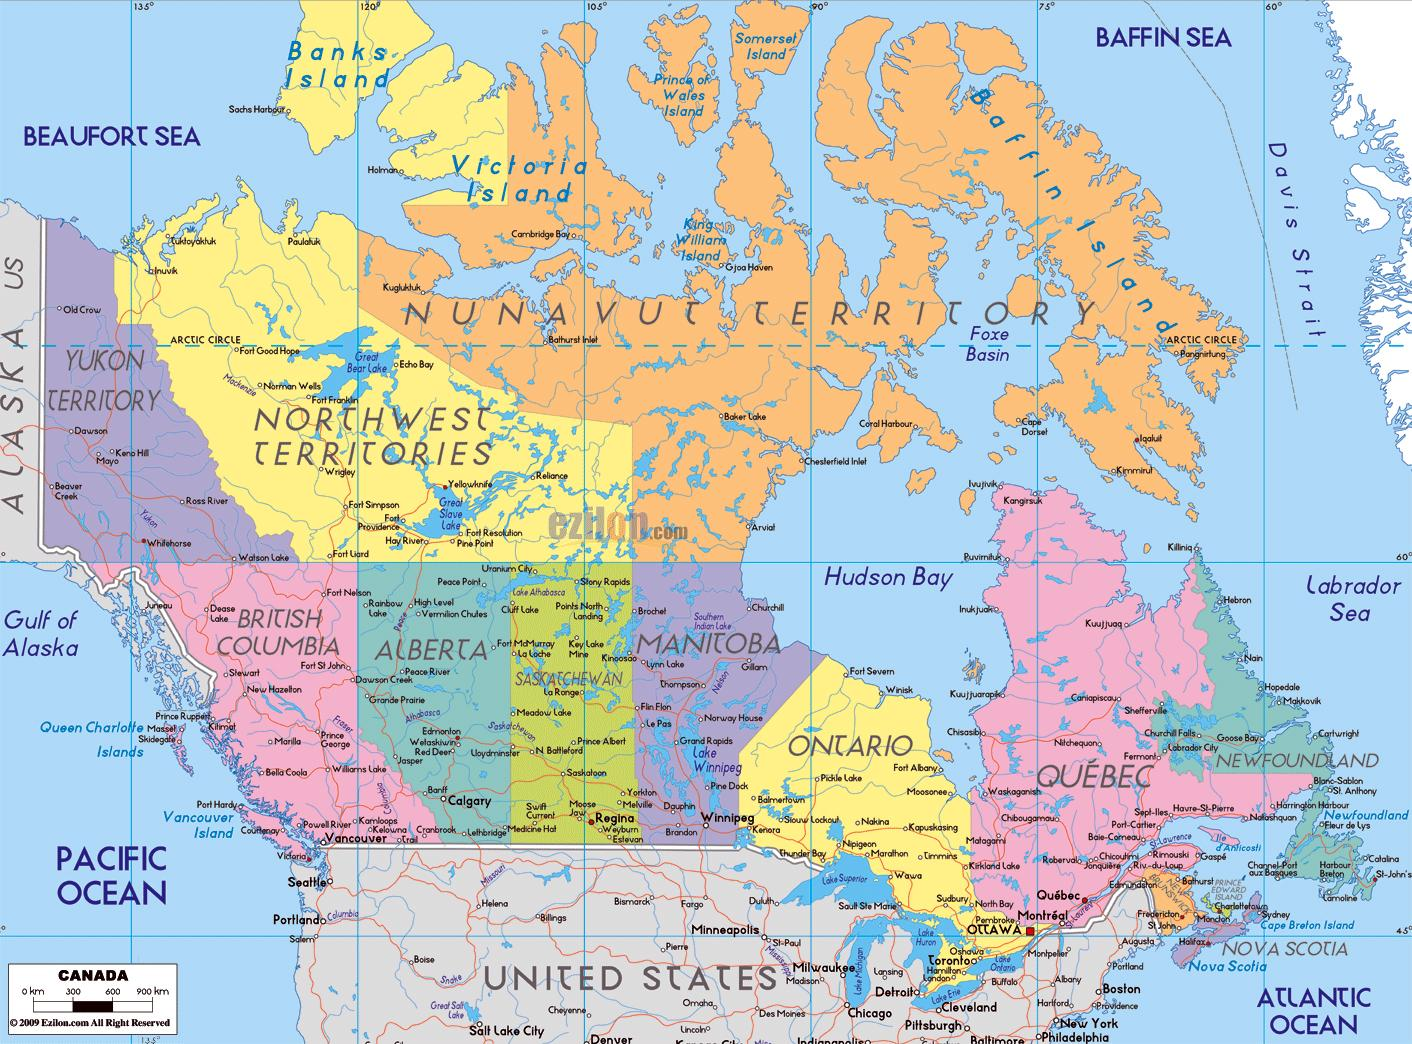 map of usa states and cities with Kanada Mapa Z Nazwami Miast on Kanada Mapa Z Nazwami Miast additionally Alexander Archipelago 6567 besides Urbanization also Libya likewise Nevada map.